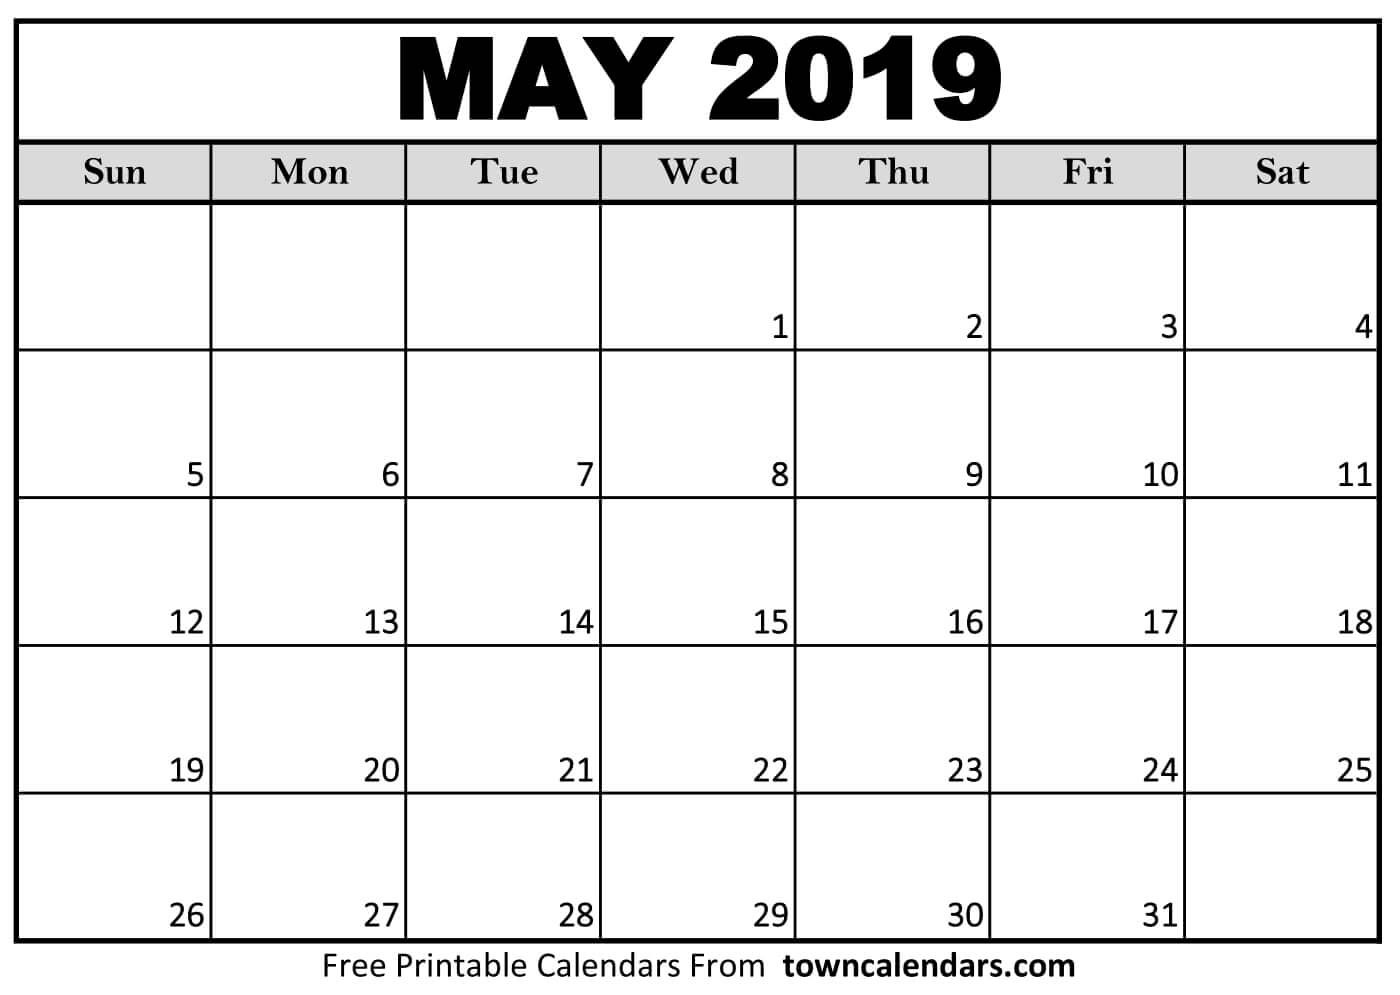 Printable Calendars 2019 Free Printable May 2019 Calendar towncalendars